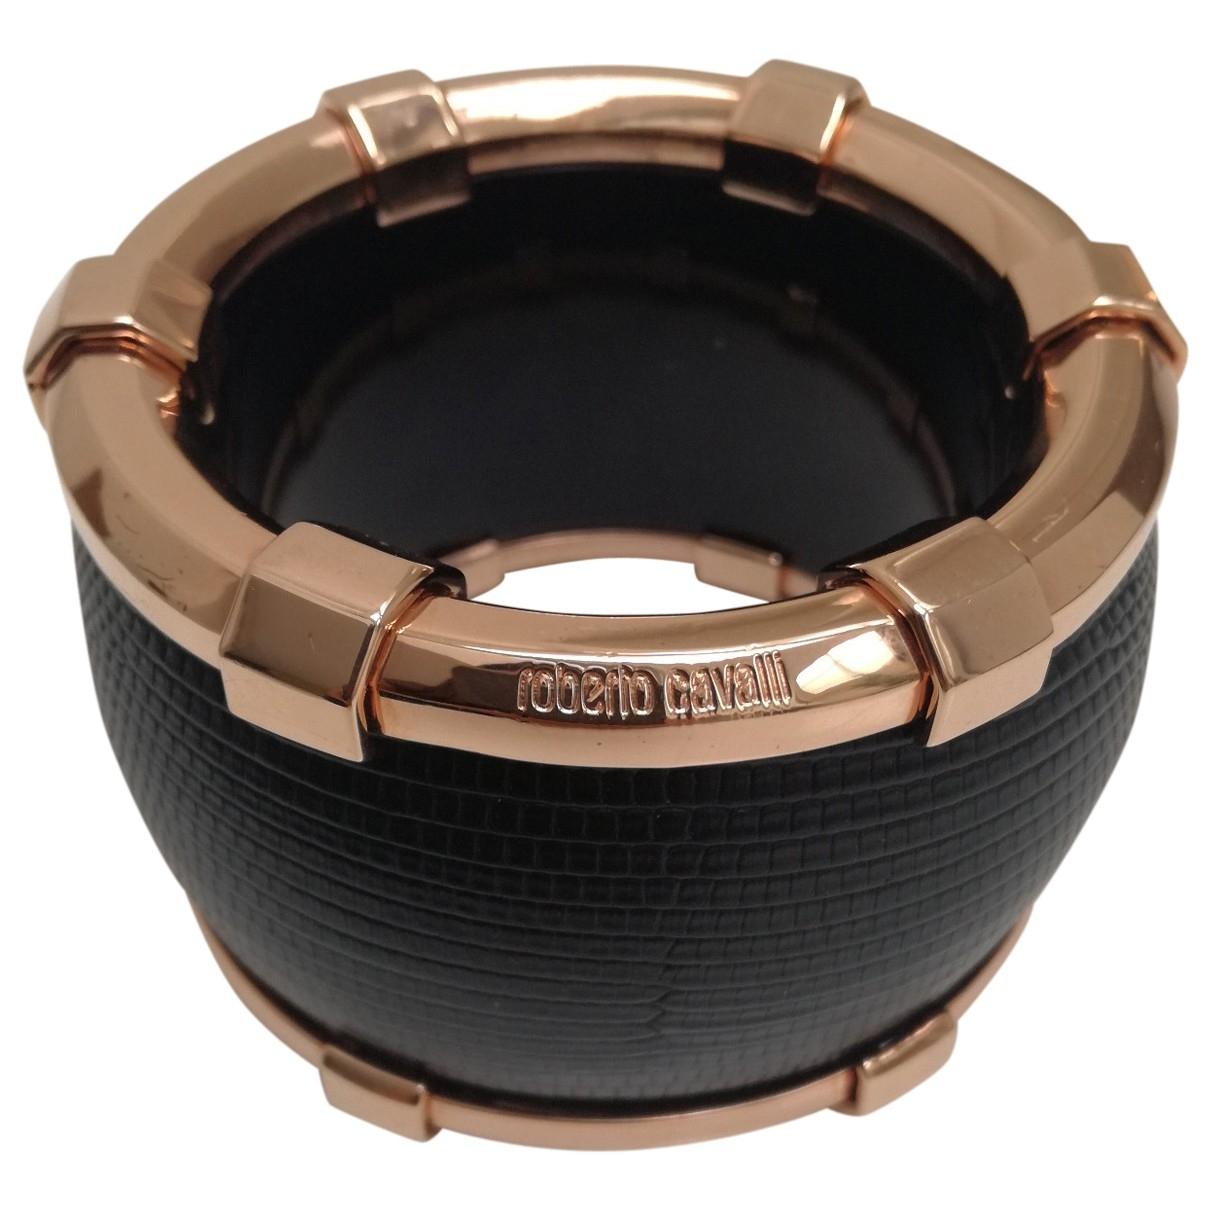 Roberto Cavalli - Bracelet   pour femme en lezard - noir